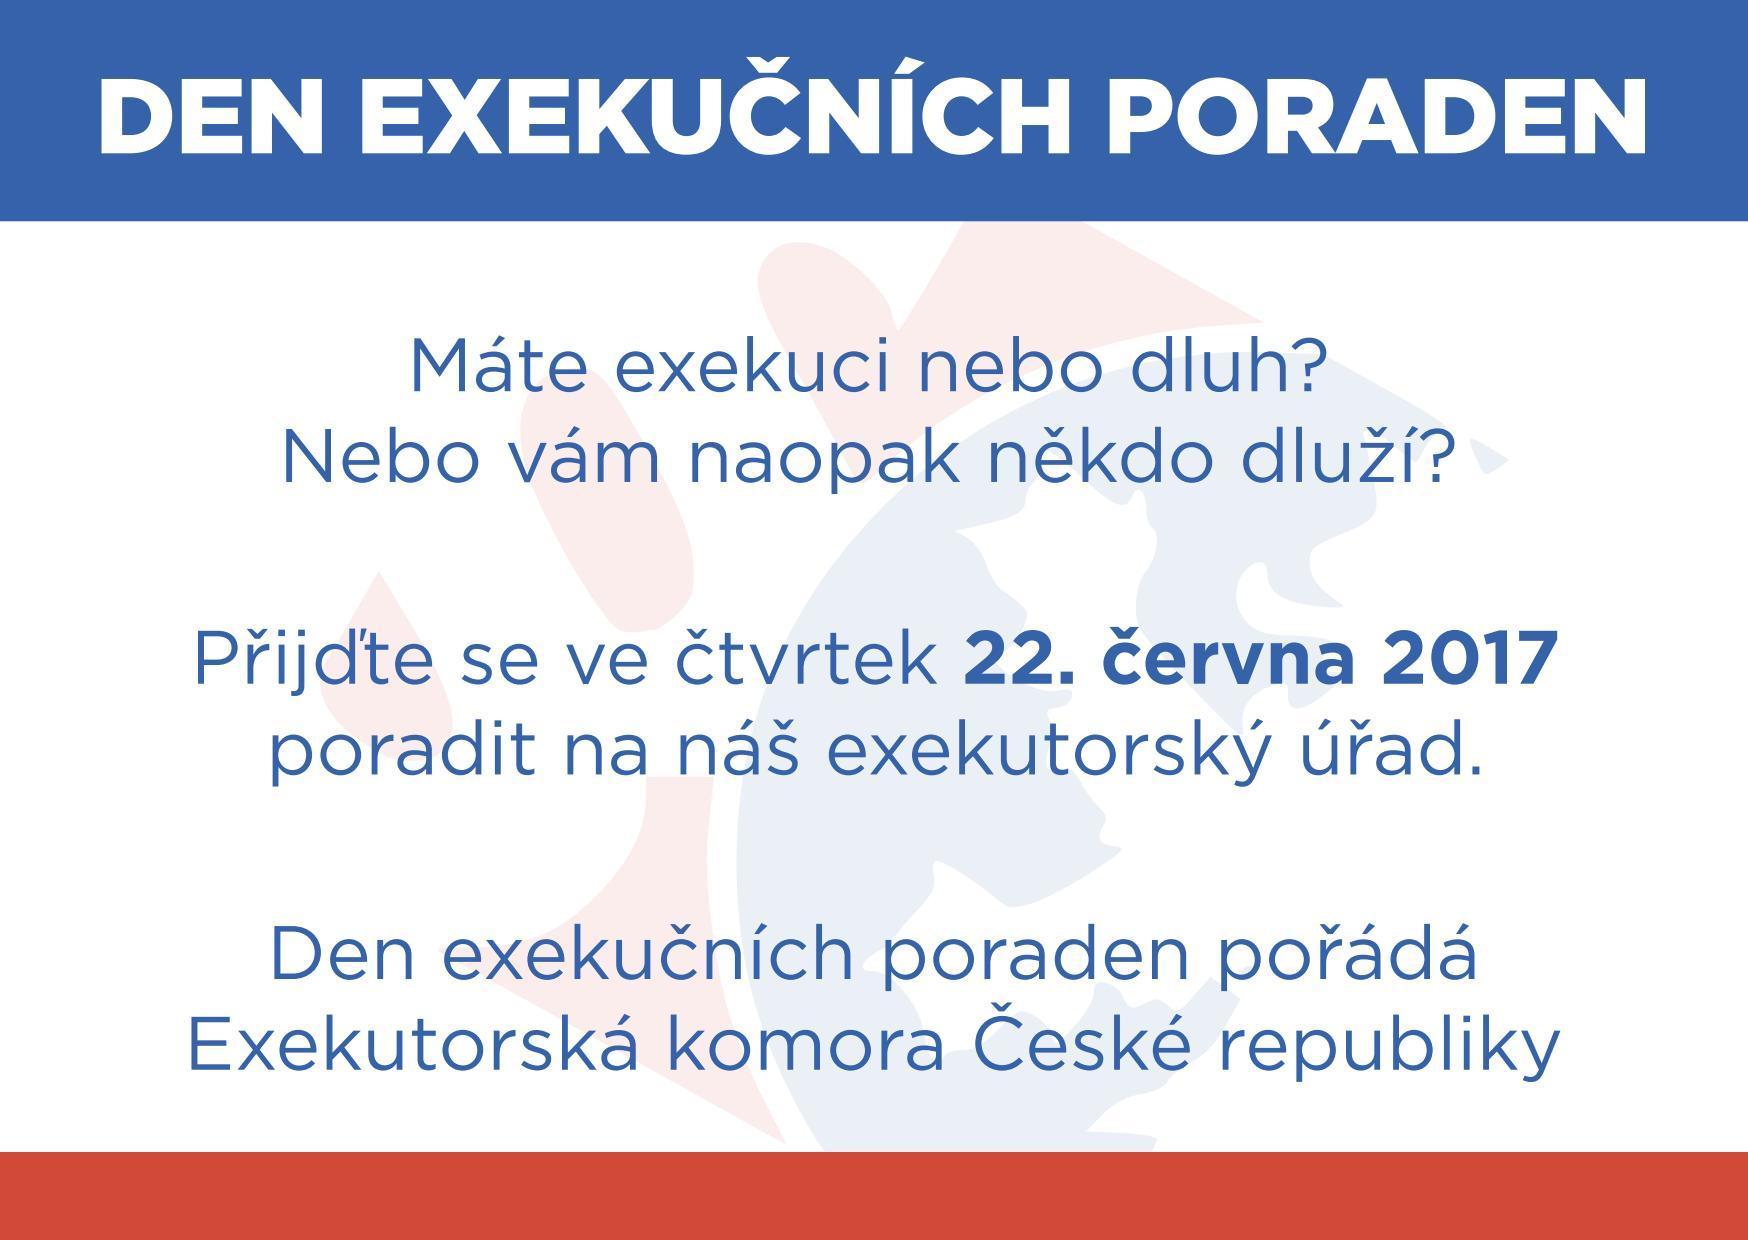 Den exekučních poraden - čtvrtek 22. června